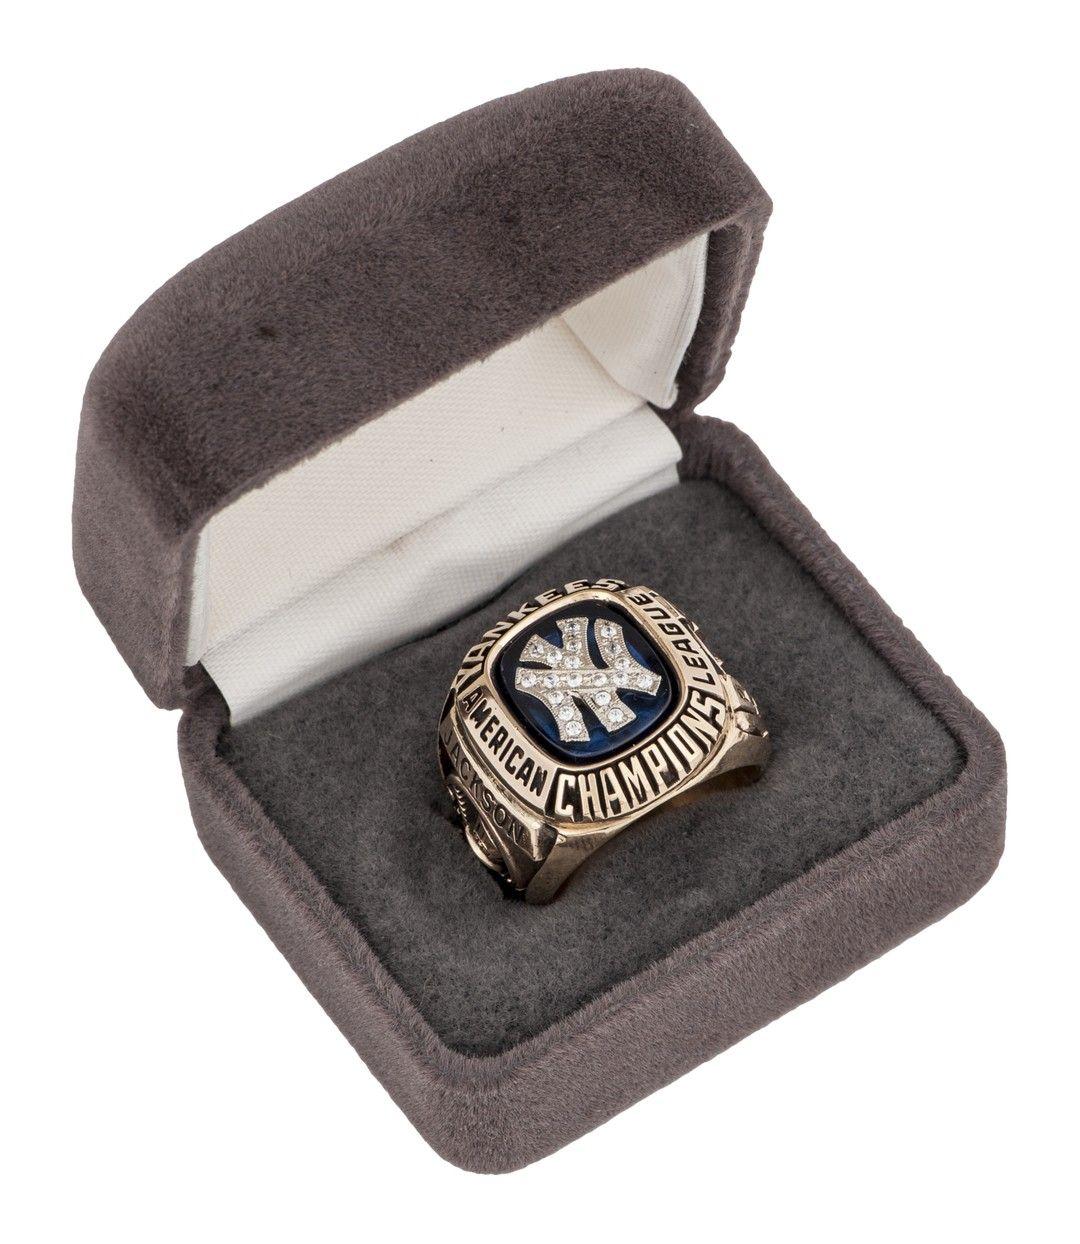 New York Yankees MLB World Series Championship Ring for